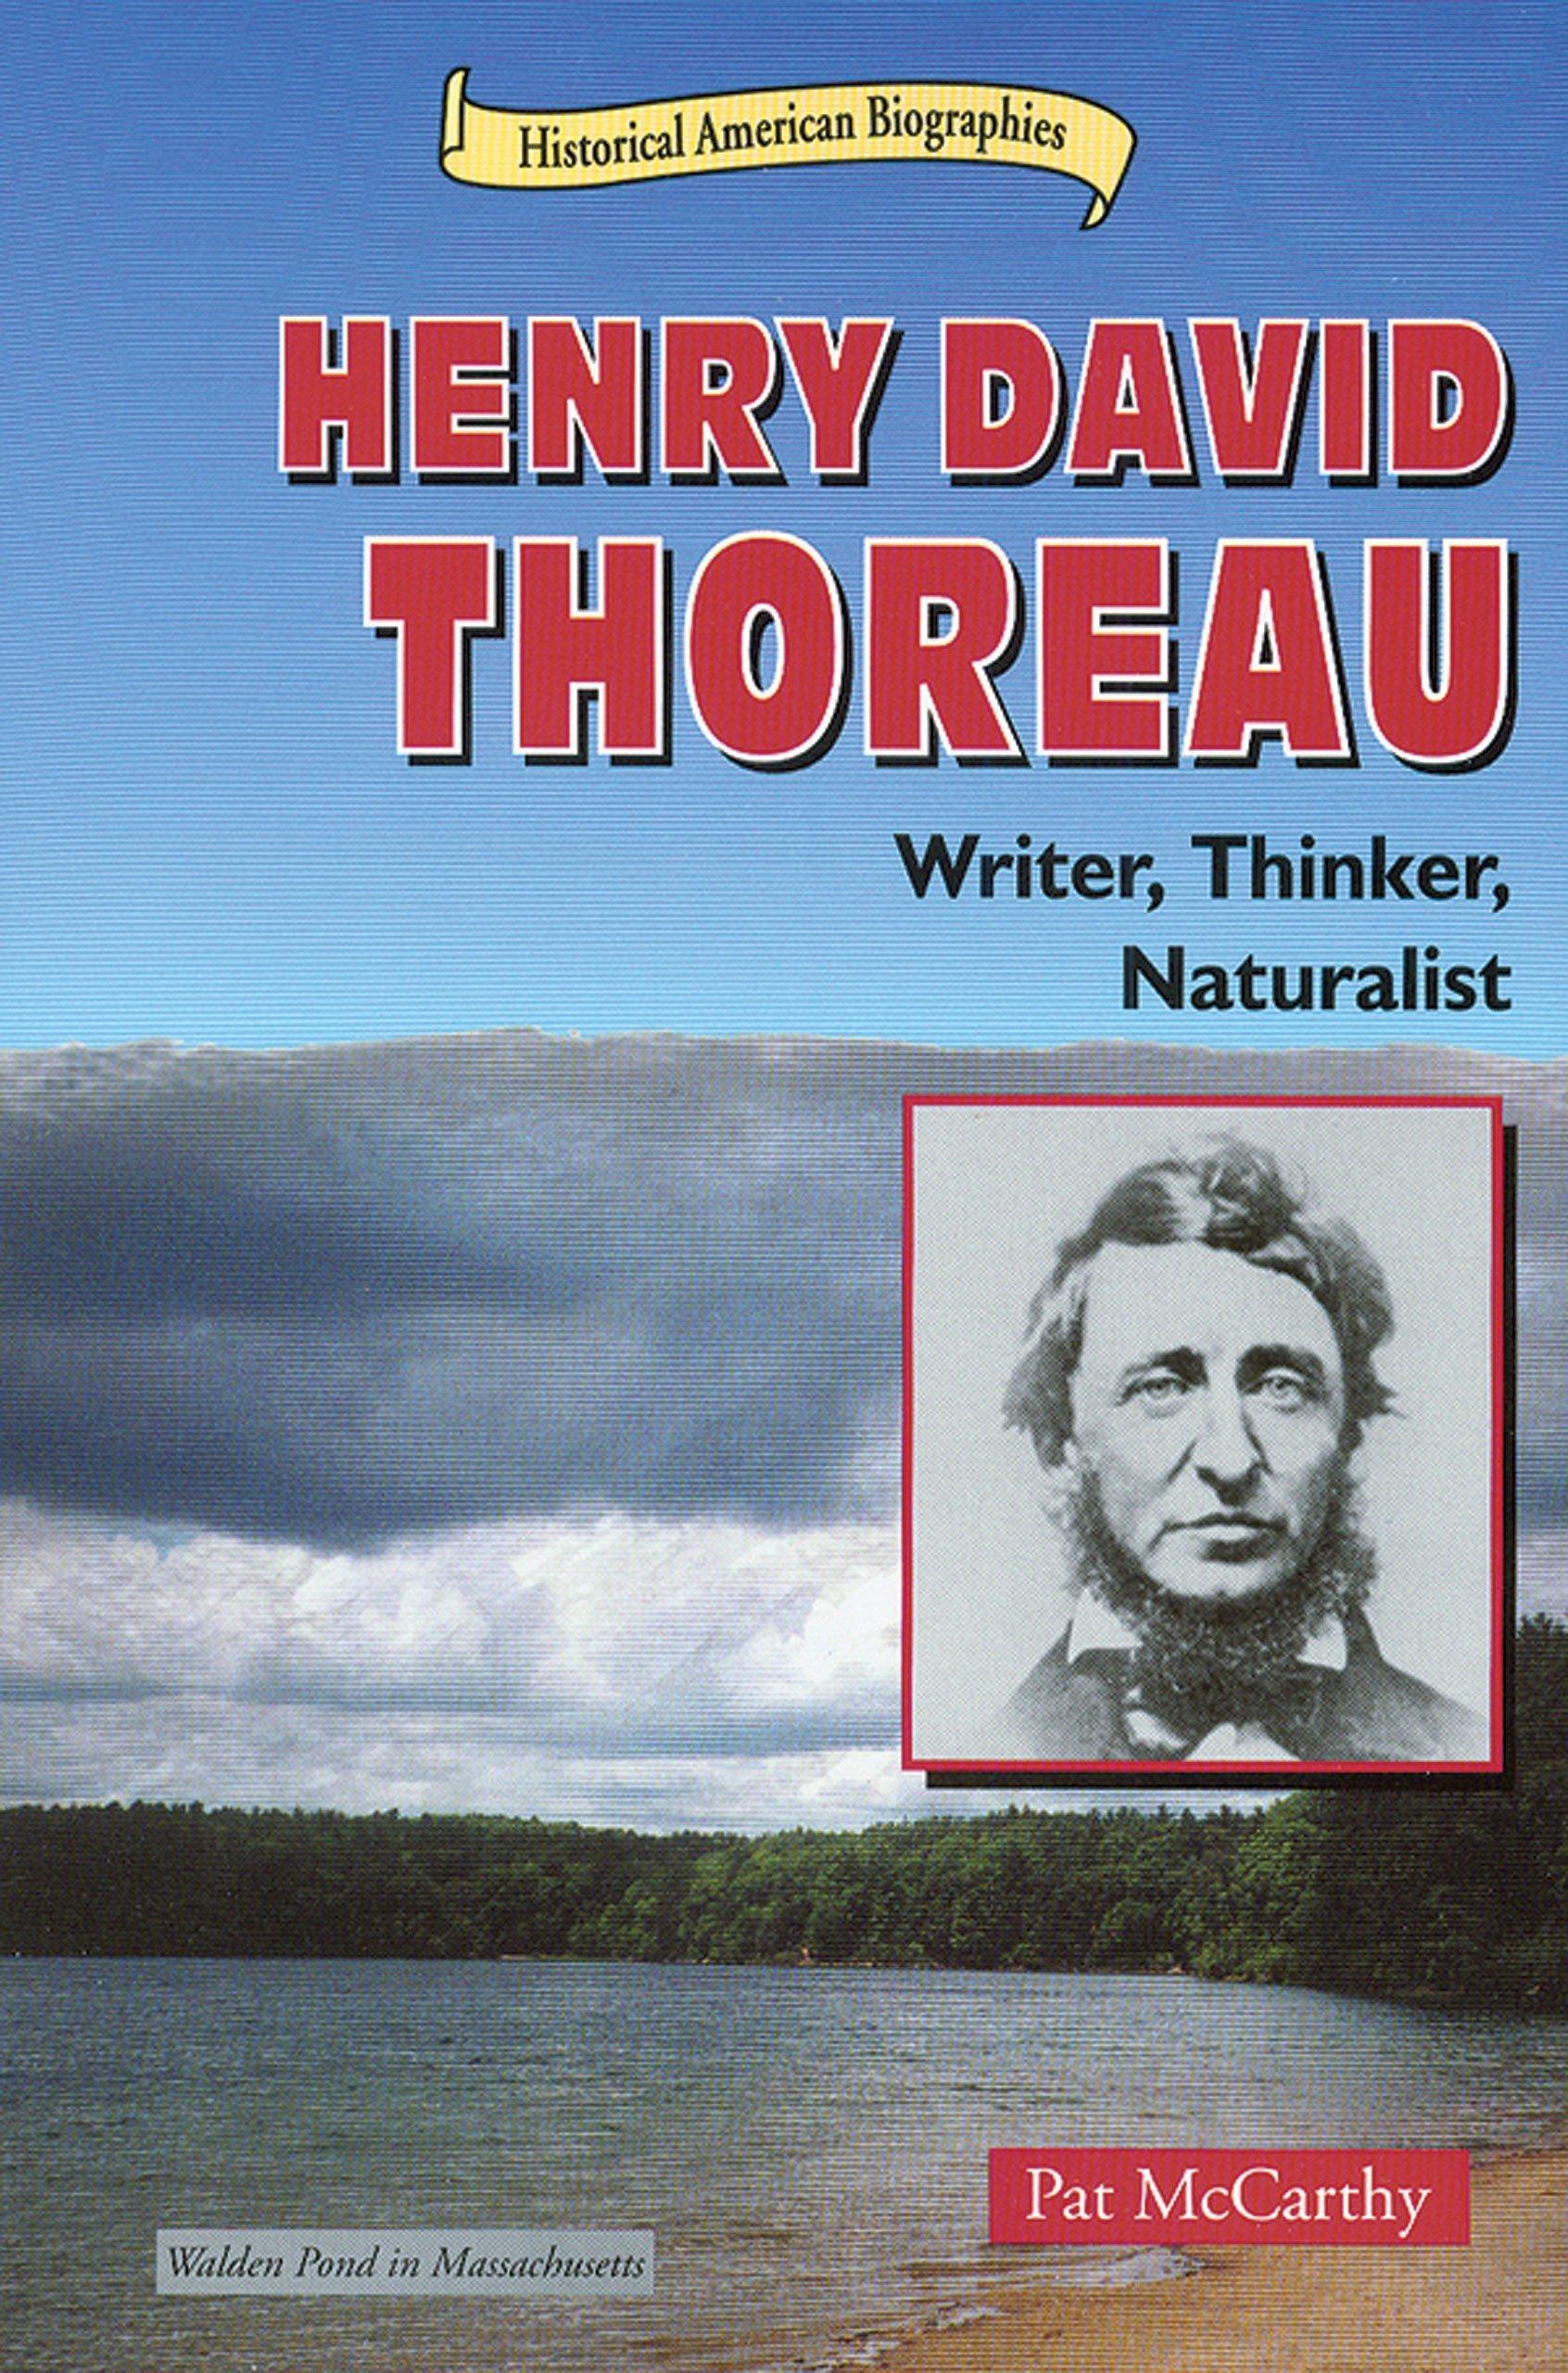 Henry David Thoreau: Writer, Thinker, Naturalist (Historical American Biographies)